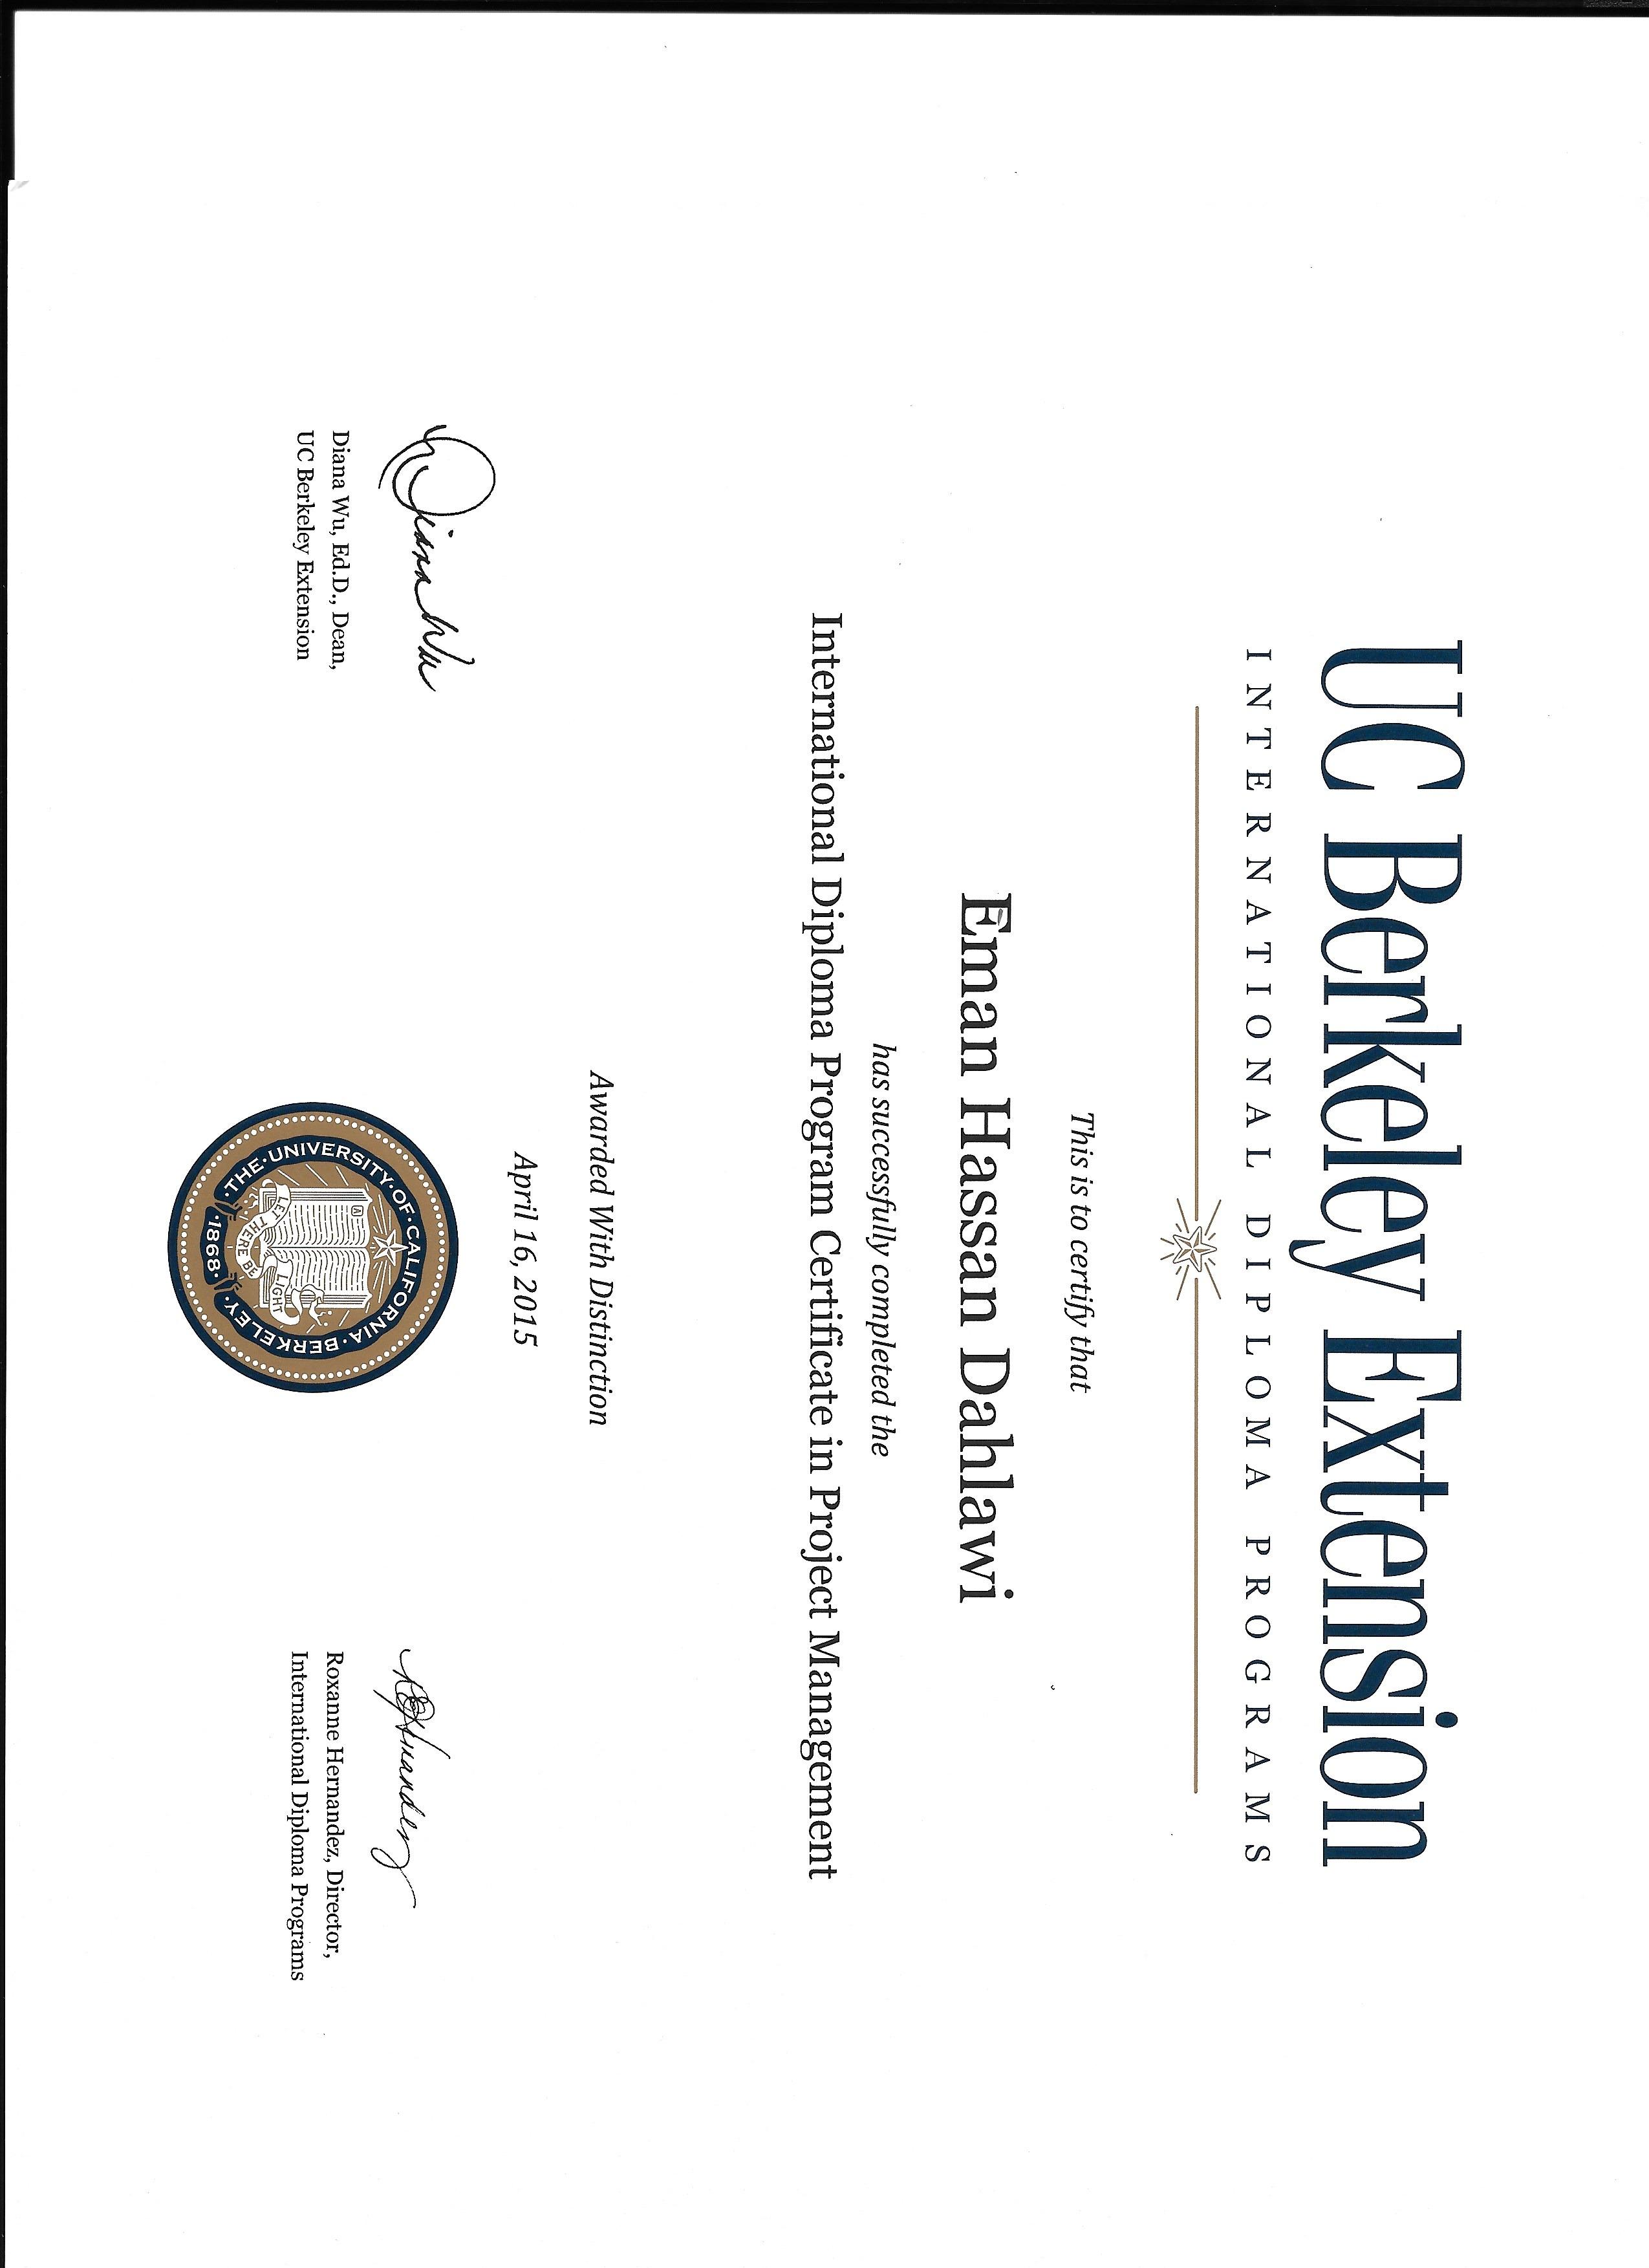 Free Professional Resume Uc Berkeley Certificate Programs